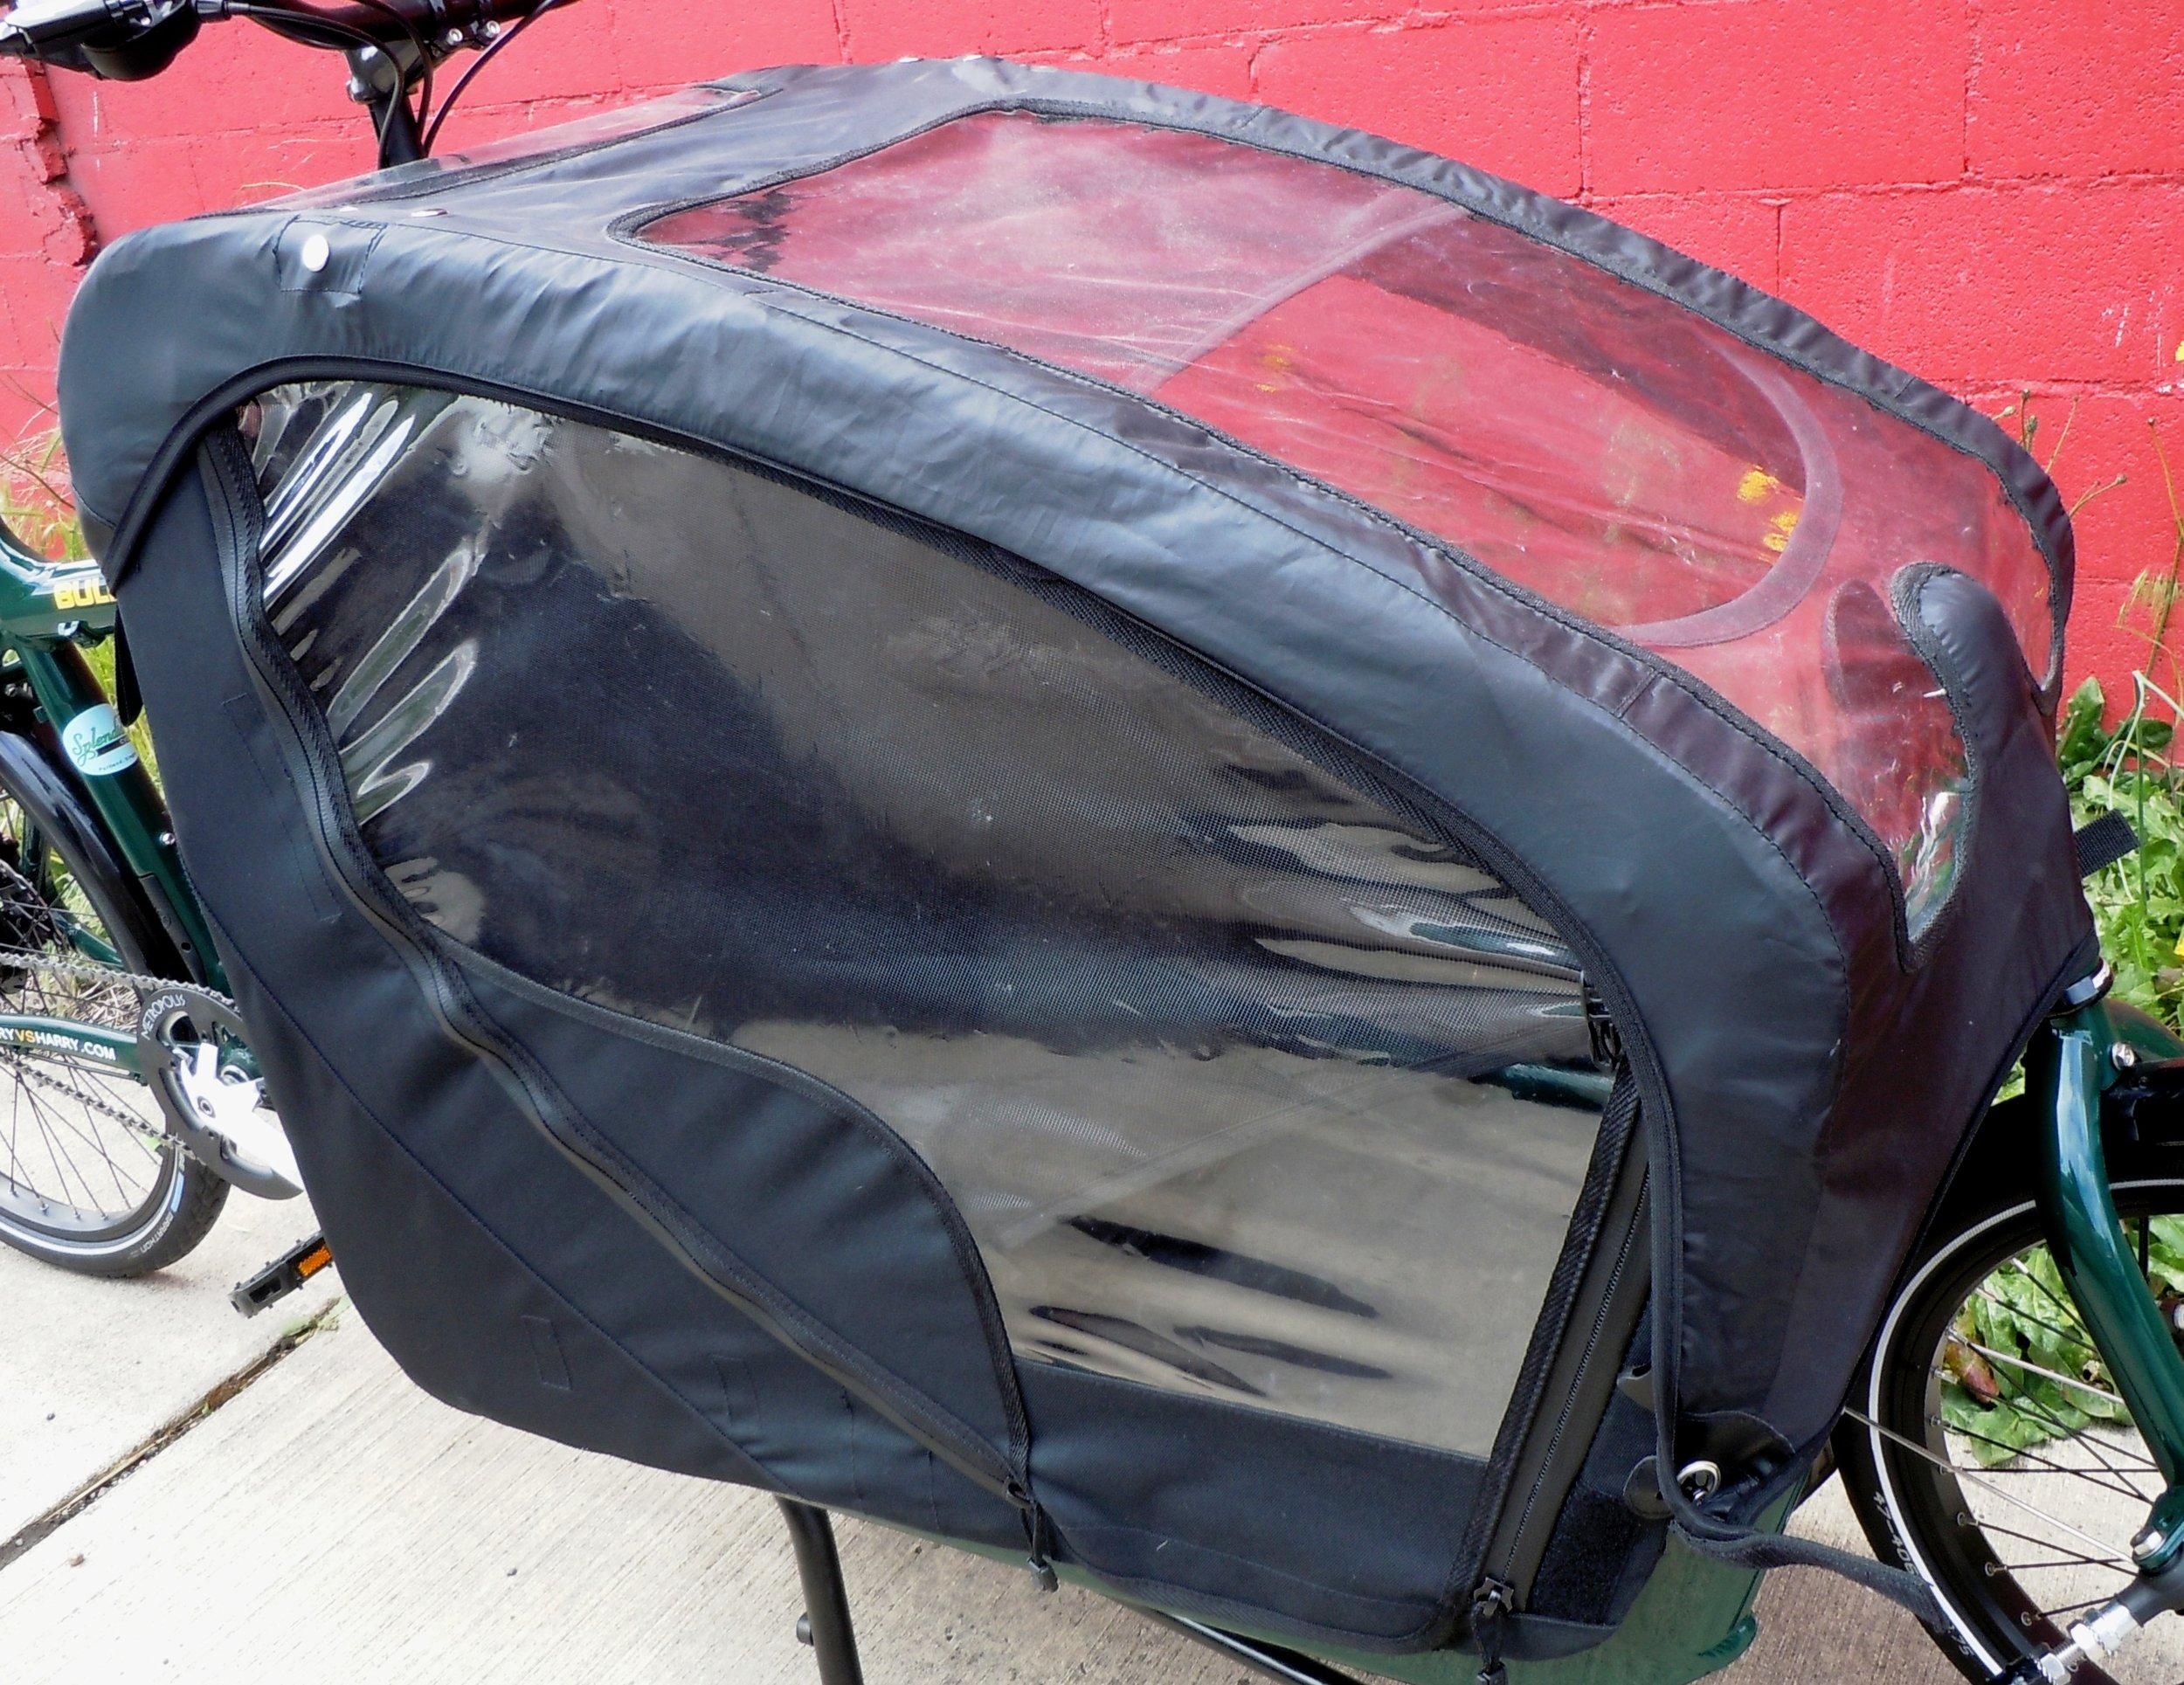 bullitt LvH kid canopy 002a.jpg